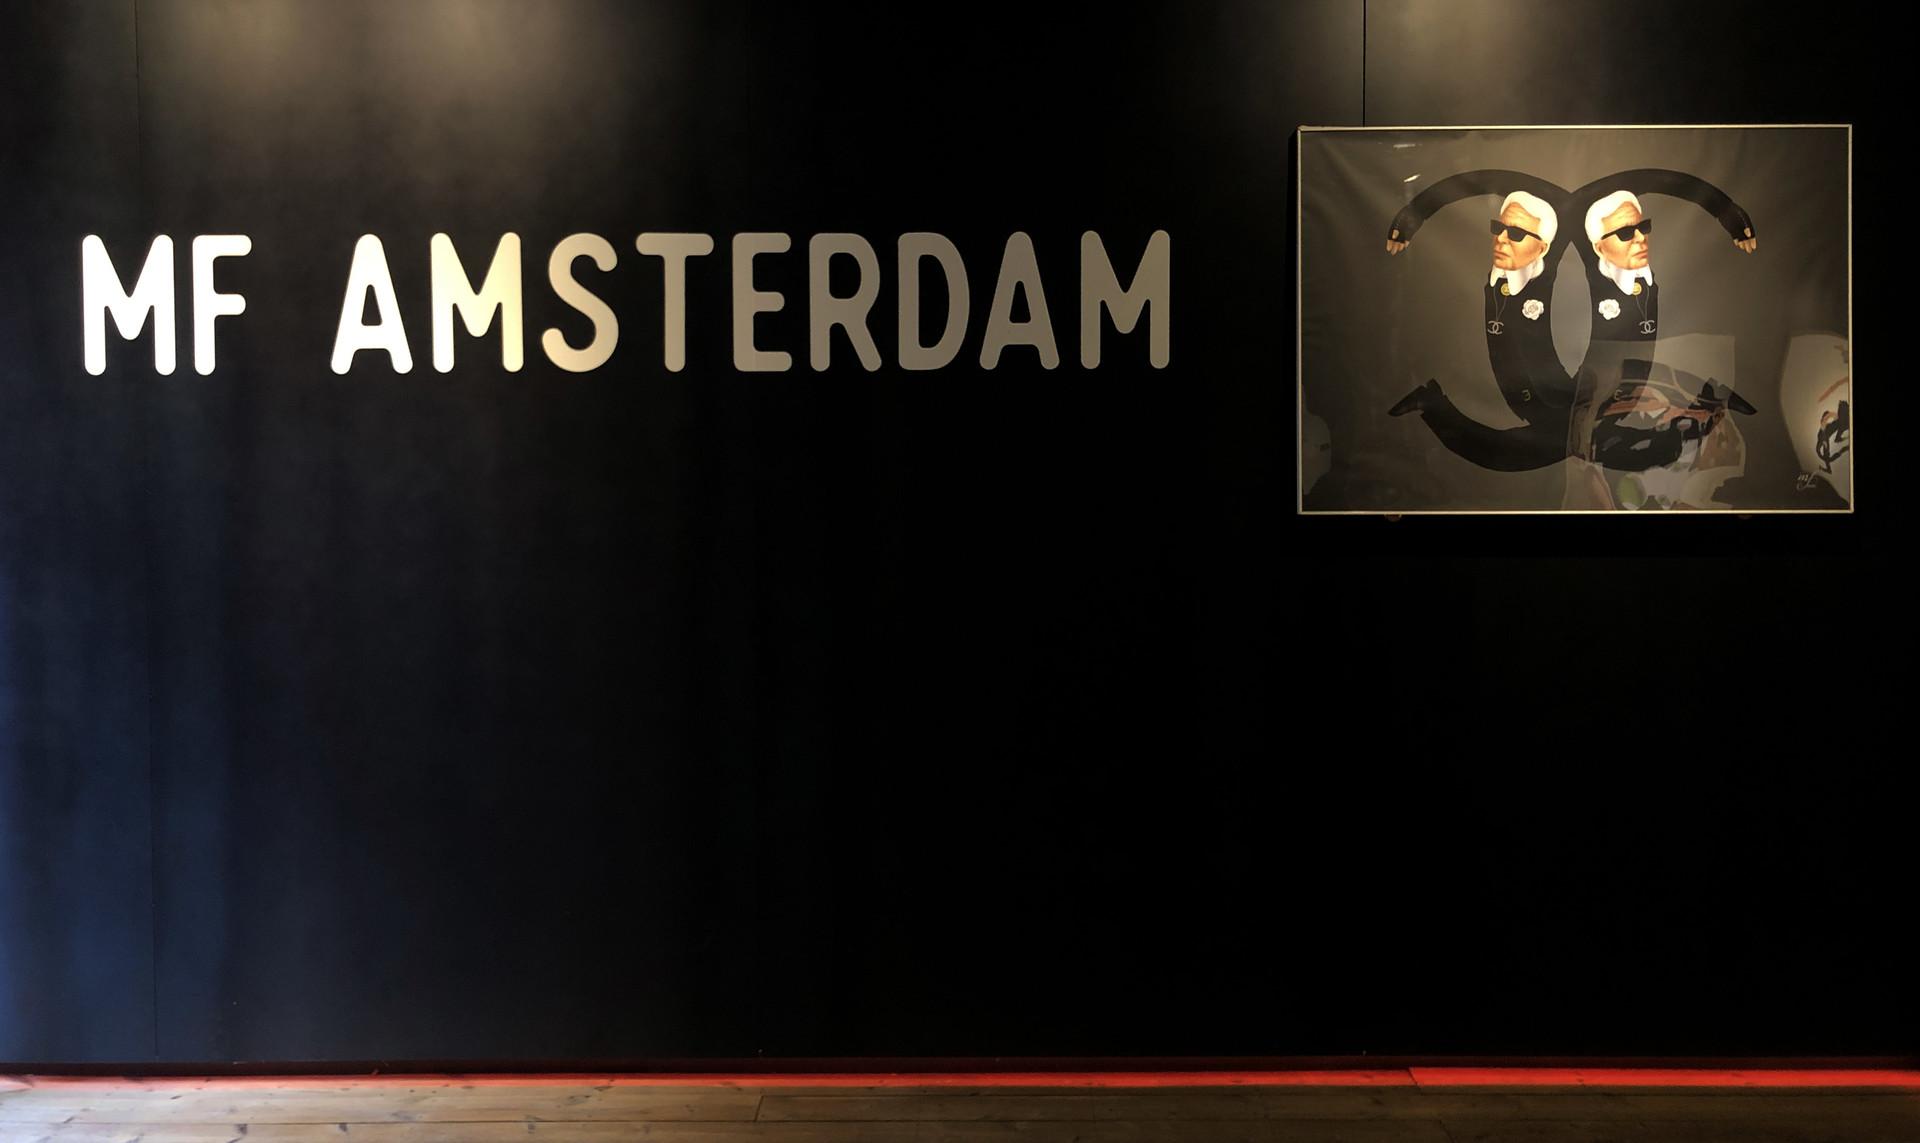 MF AMSTERDAM  / OCT. 1st  2019 - FEB. 29th 2020 / ARTSALON GAPYEONG GALLERY